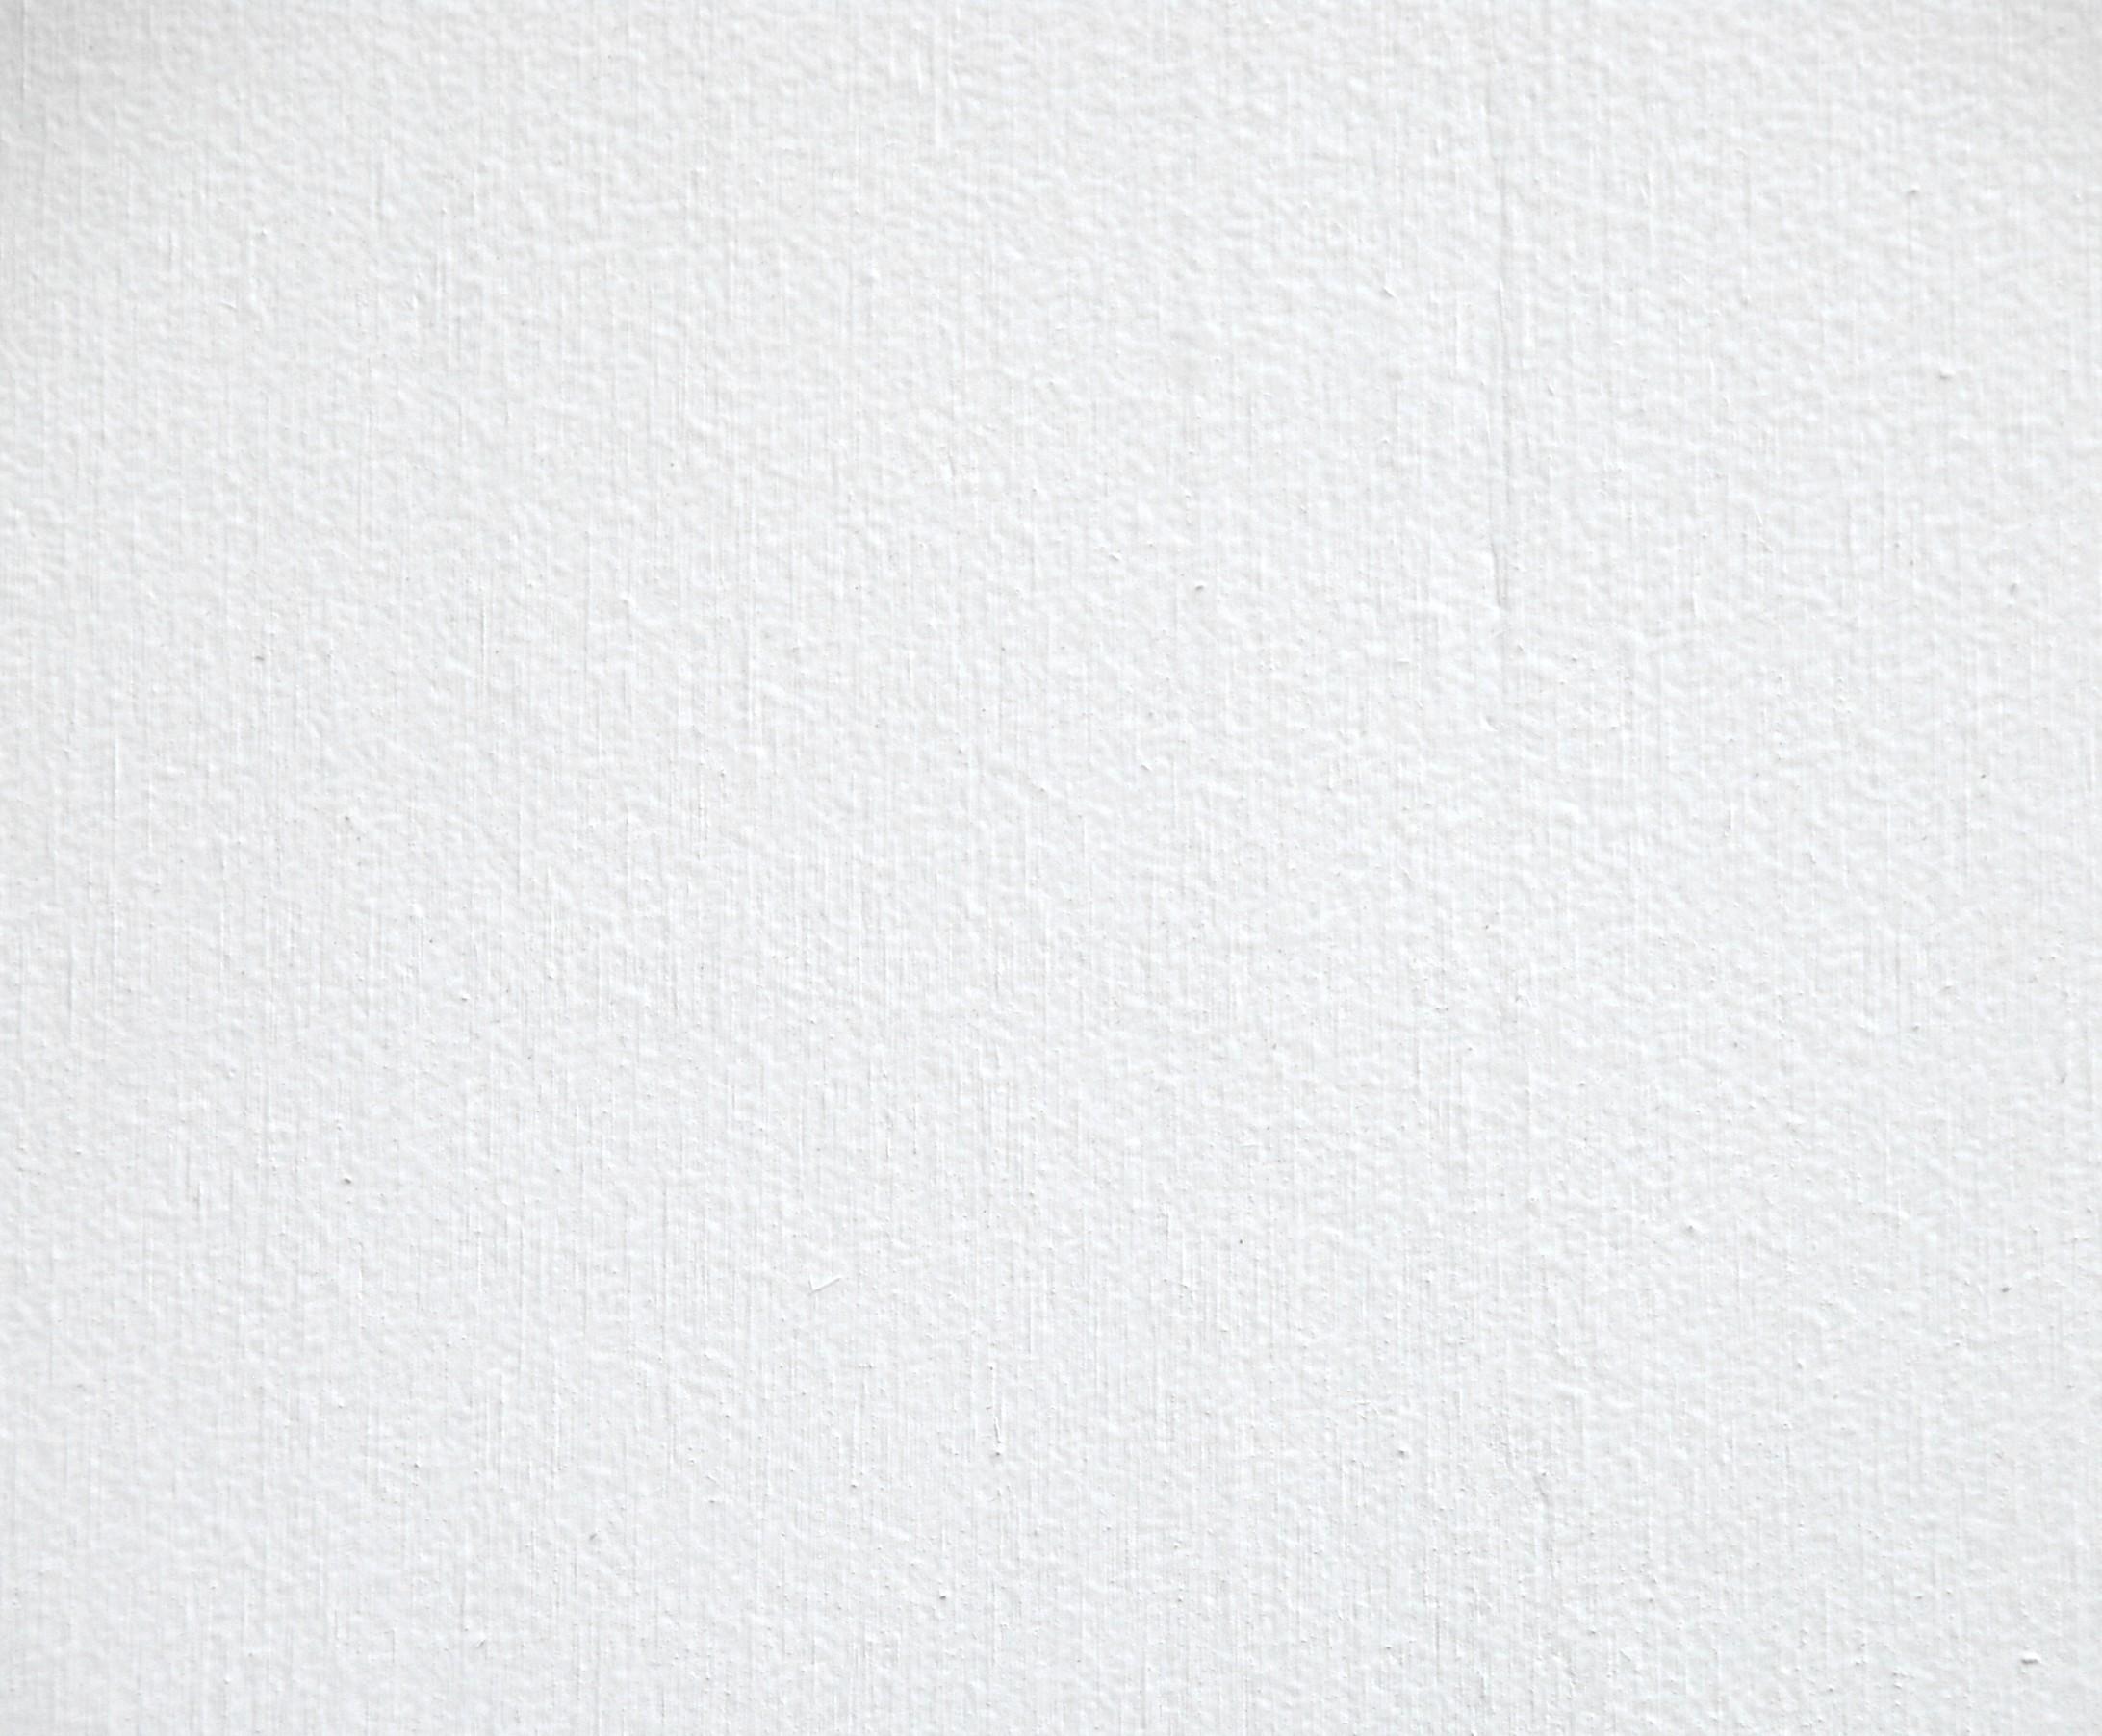 White Background Texture Image · white background texture image free  powerpoint background